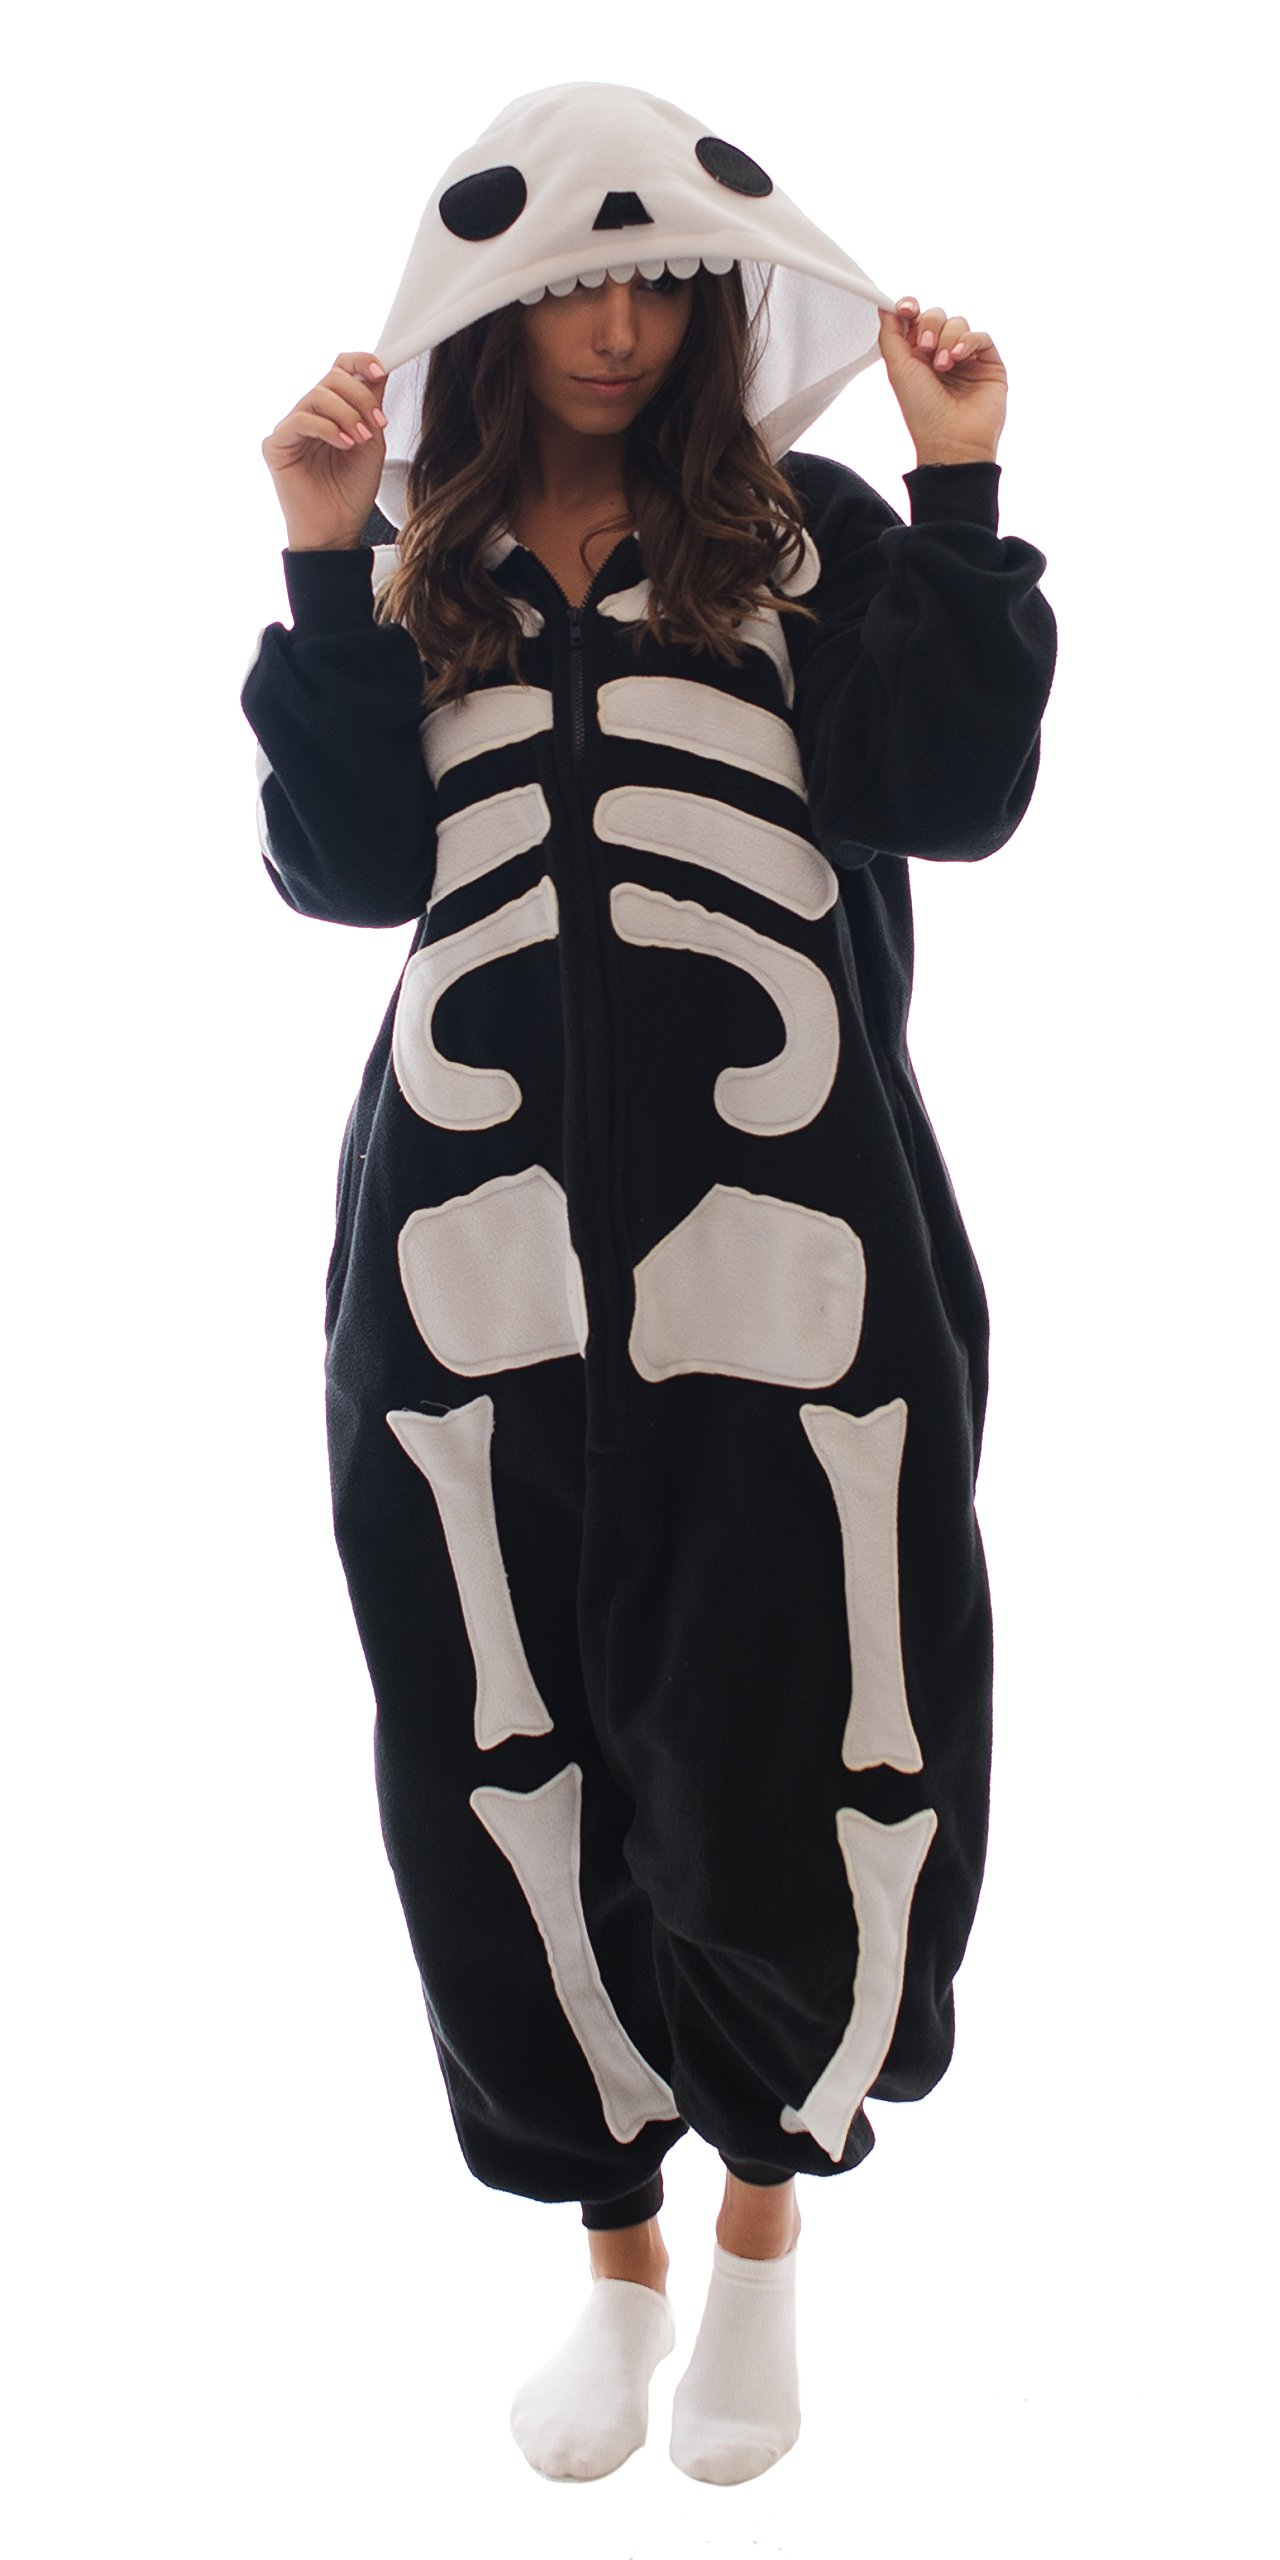 Adult Onesie Skeleton Animal Pajamas Comfortable Costume with Zipper and Pockets (Medium)